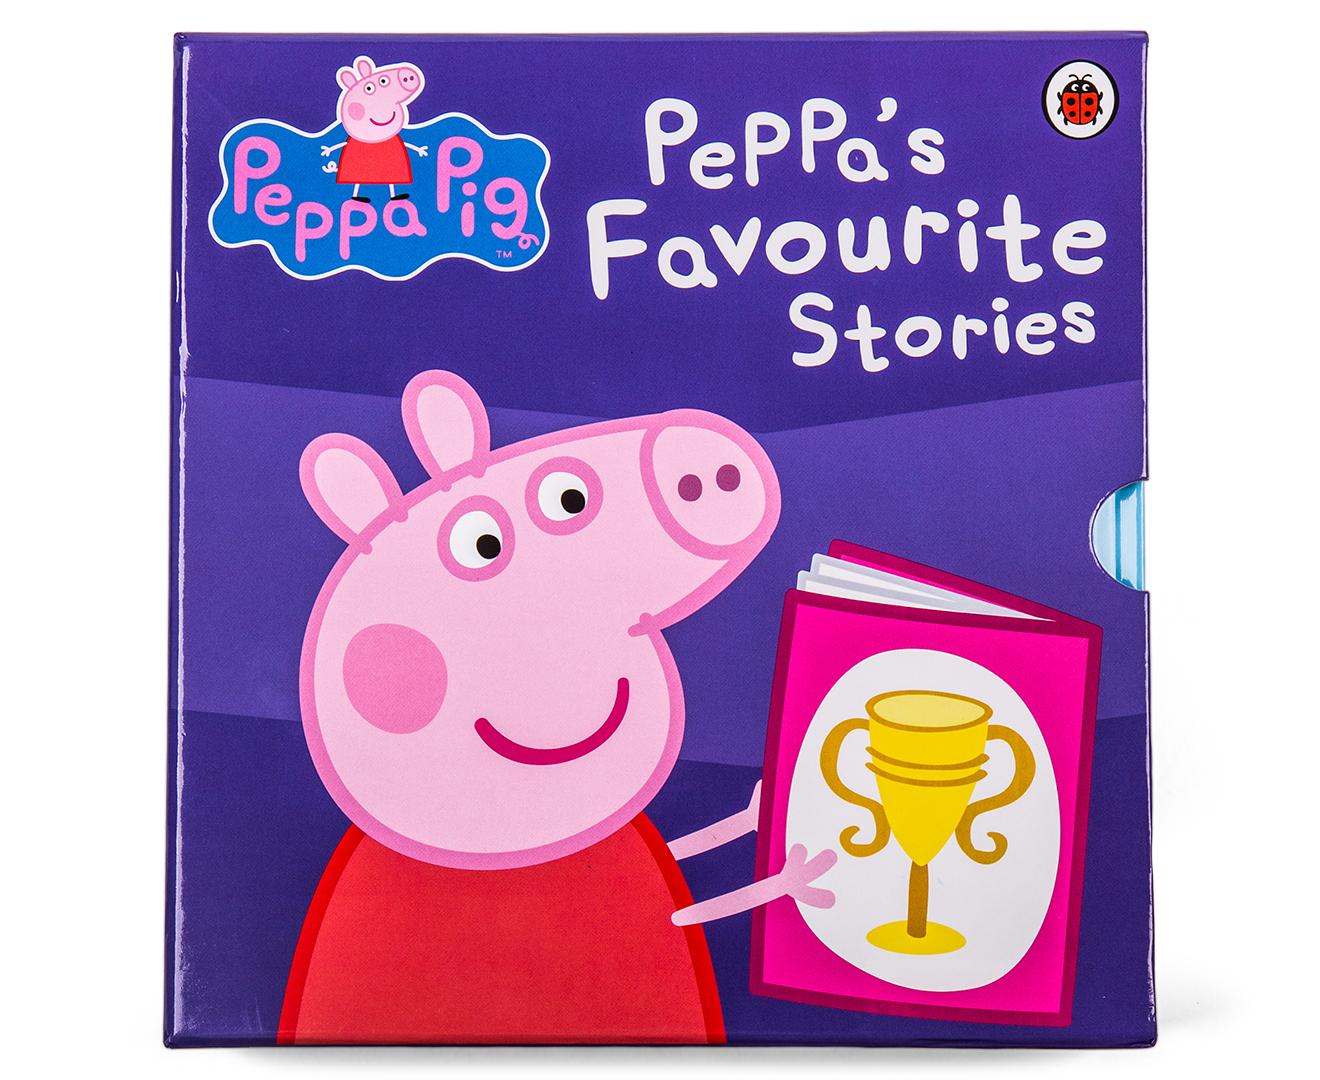 Peppa Pig Peppas Favourite Stories First Sleepover